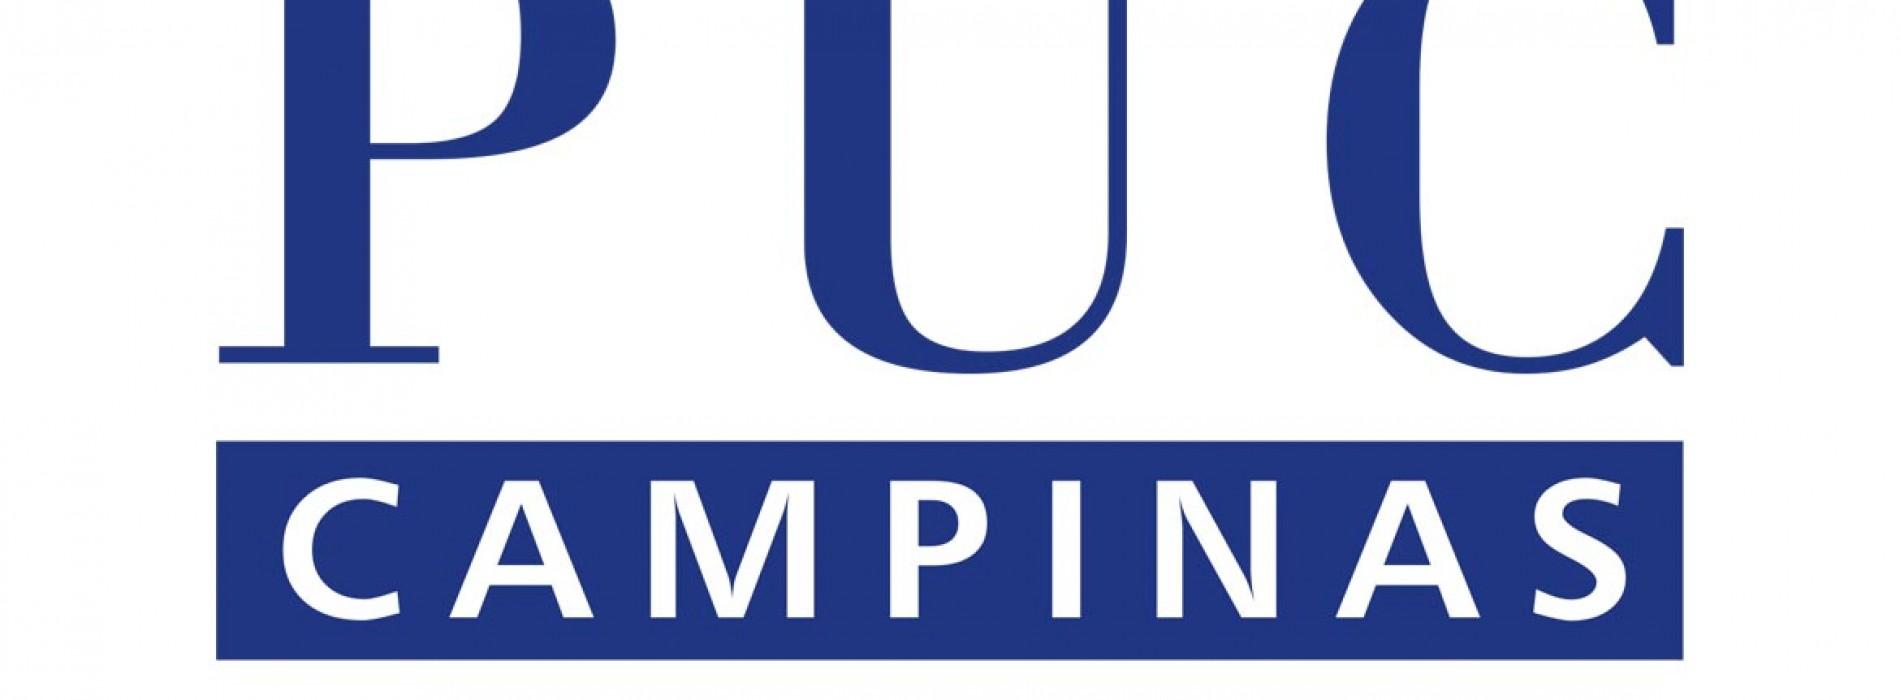 PUC-Campinas está entre as 20 universidades brasileiras mais prestigiadas do momento